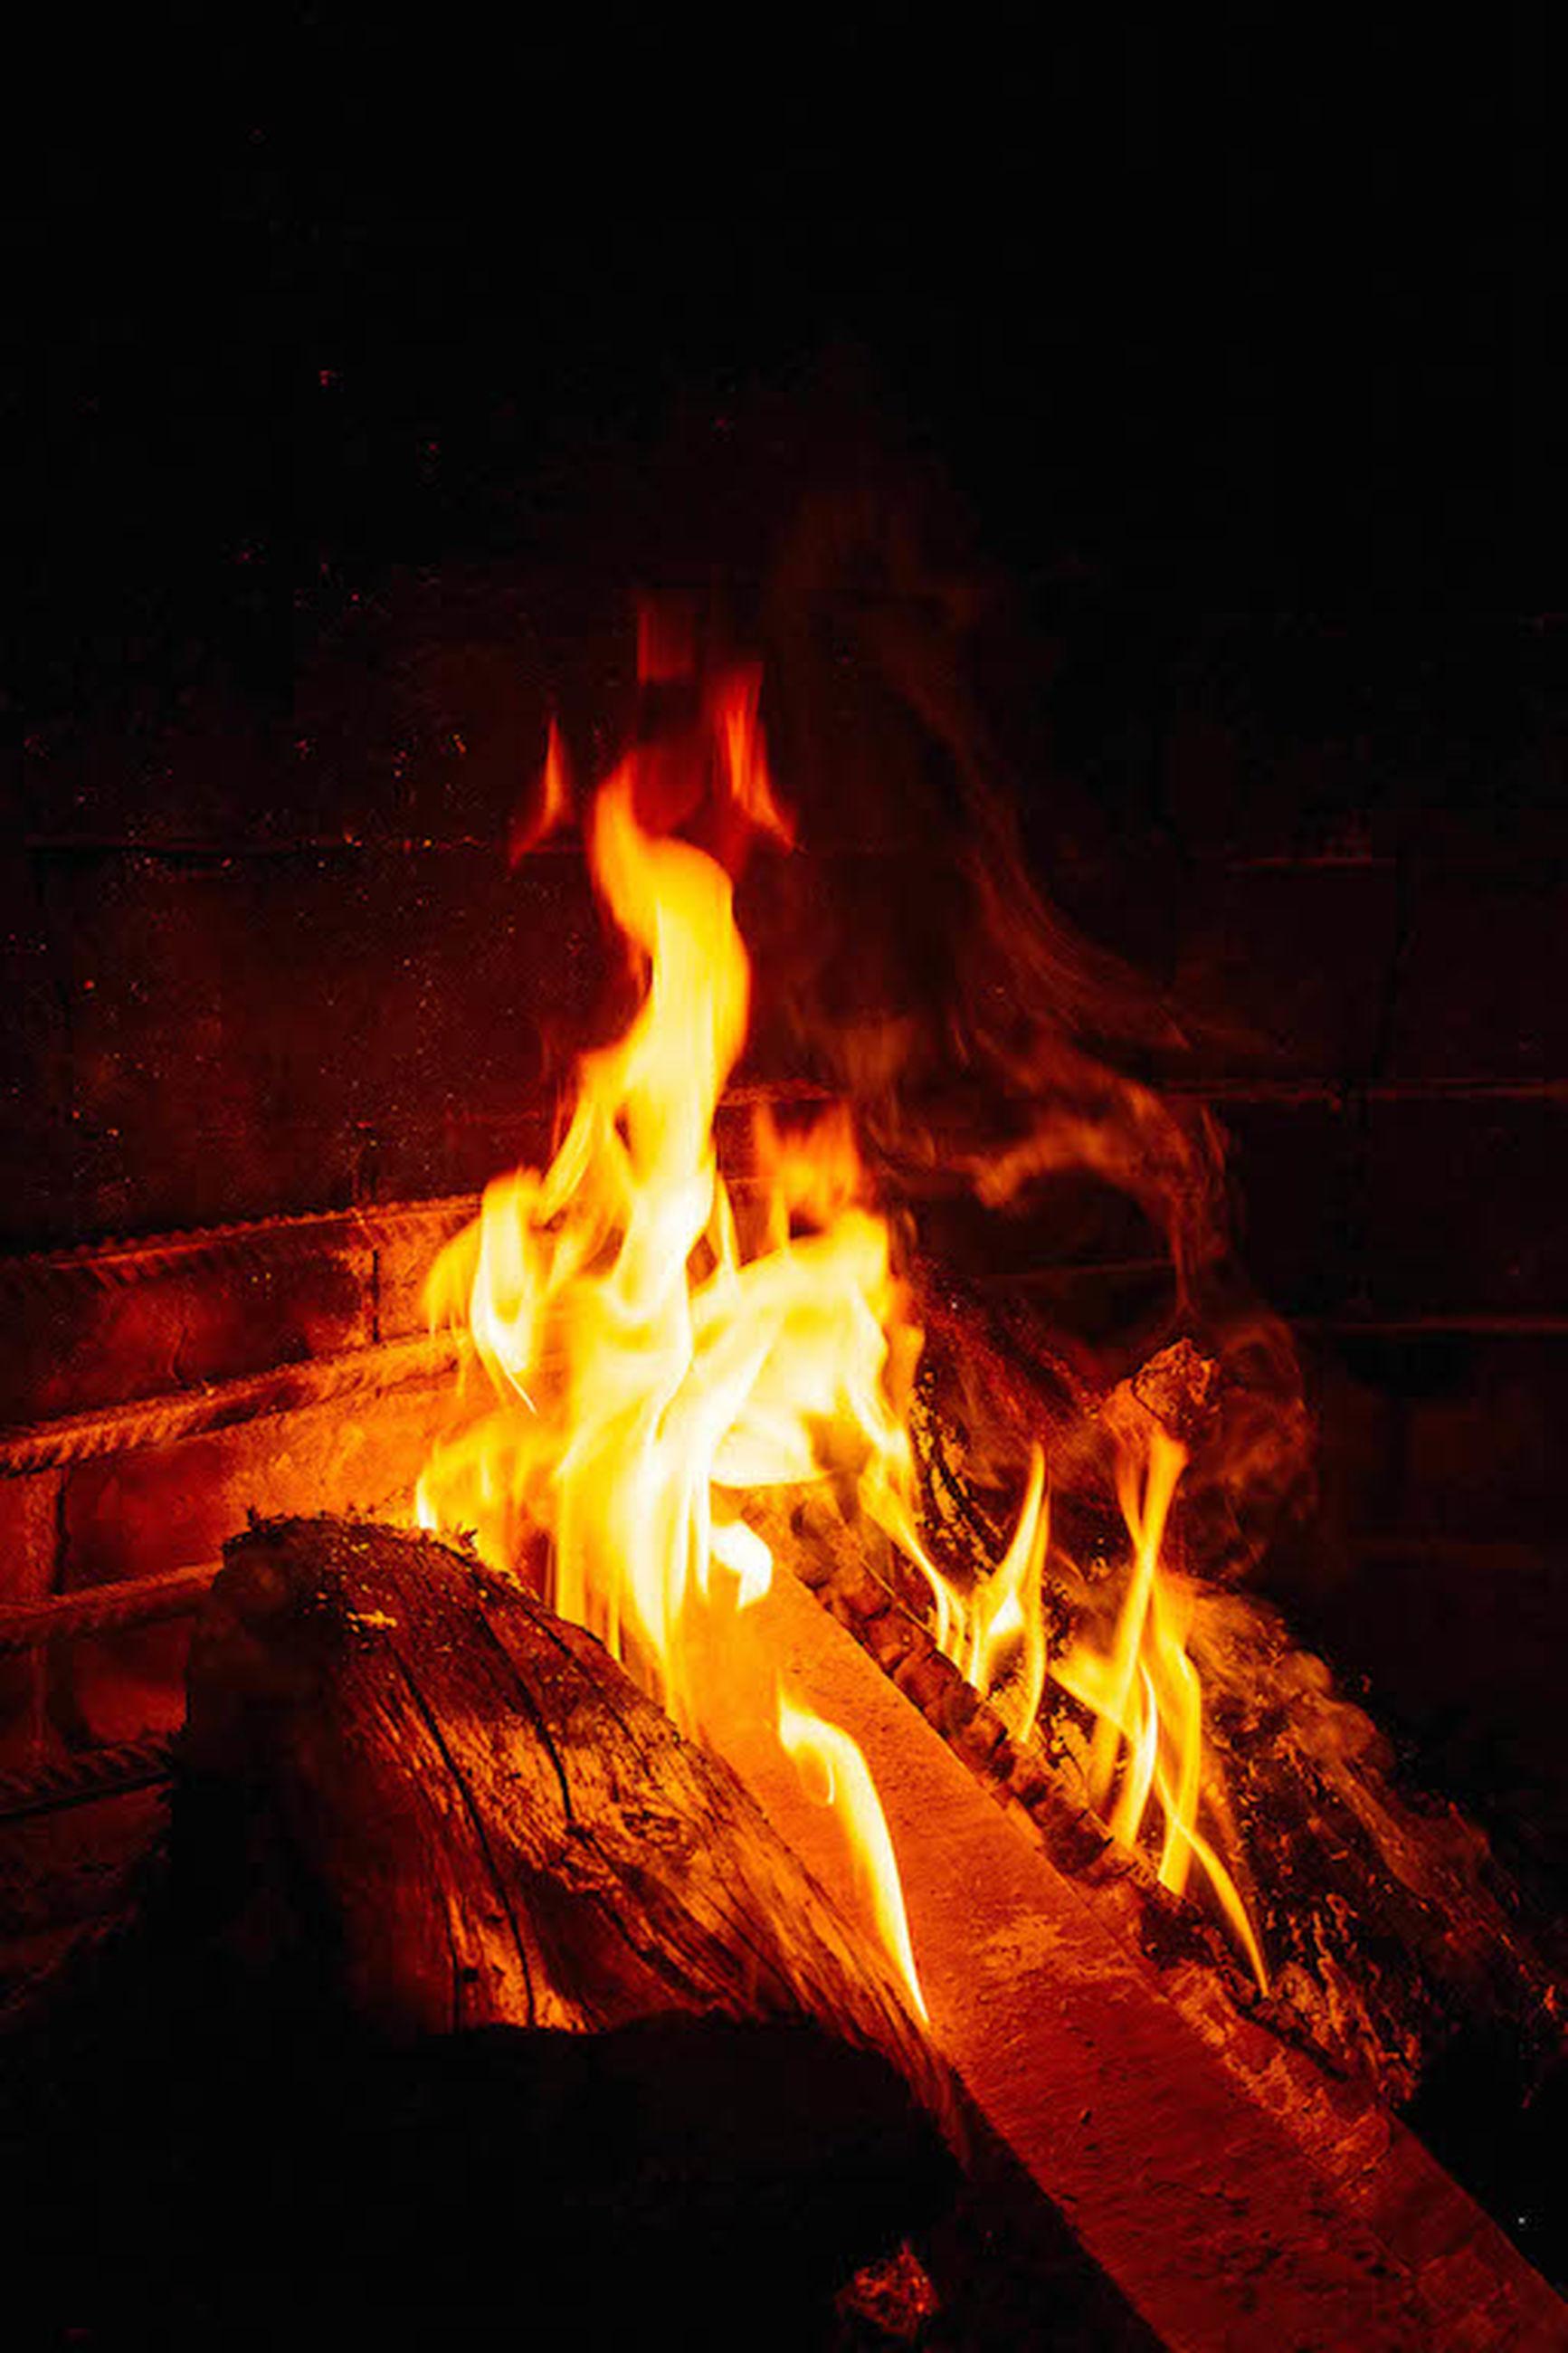 flame, fire - natural phenomenon, heat - temperature, burning, night, dark, no people, nature, close-up, outdoors